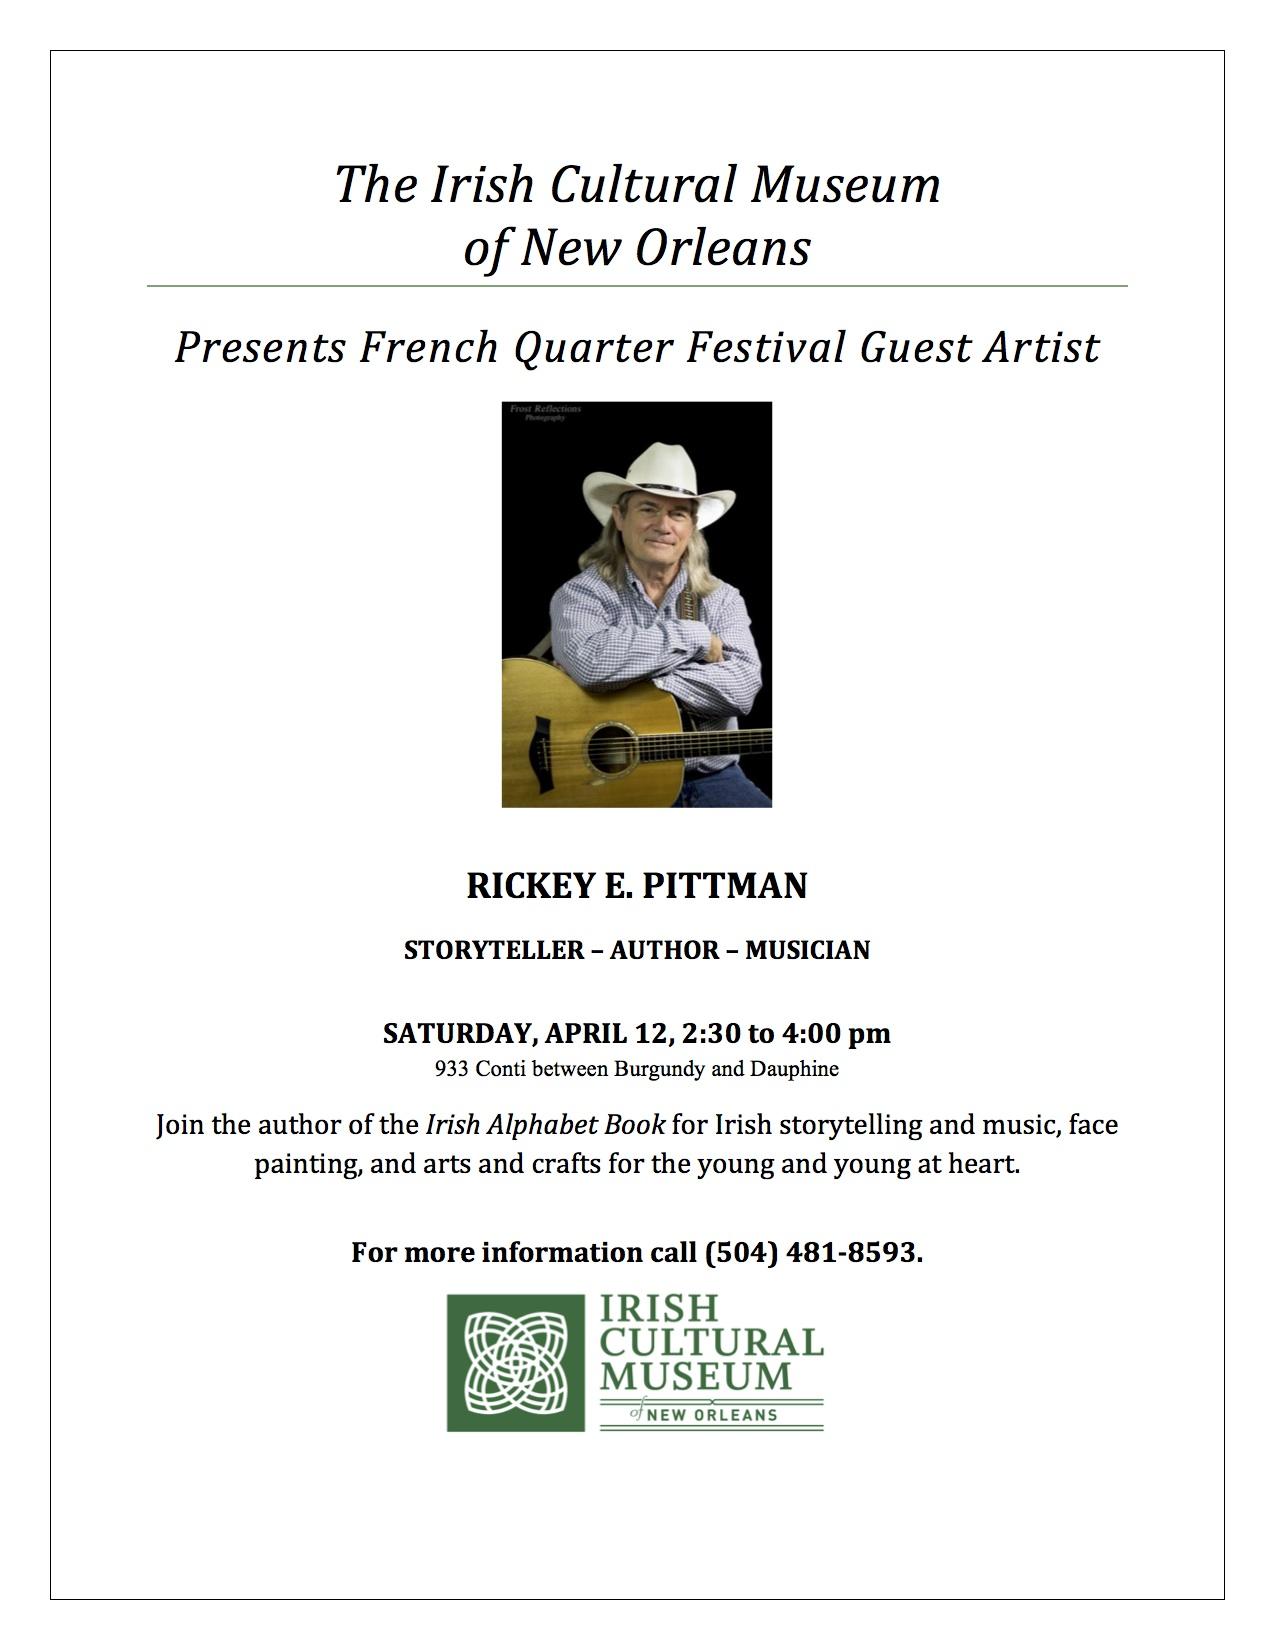 Rickey Pittman poster